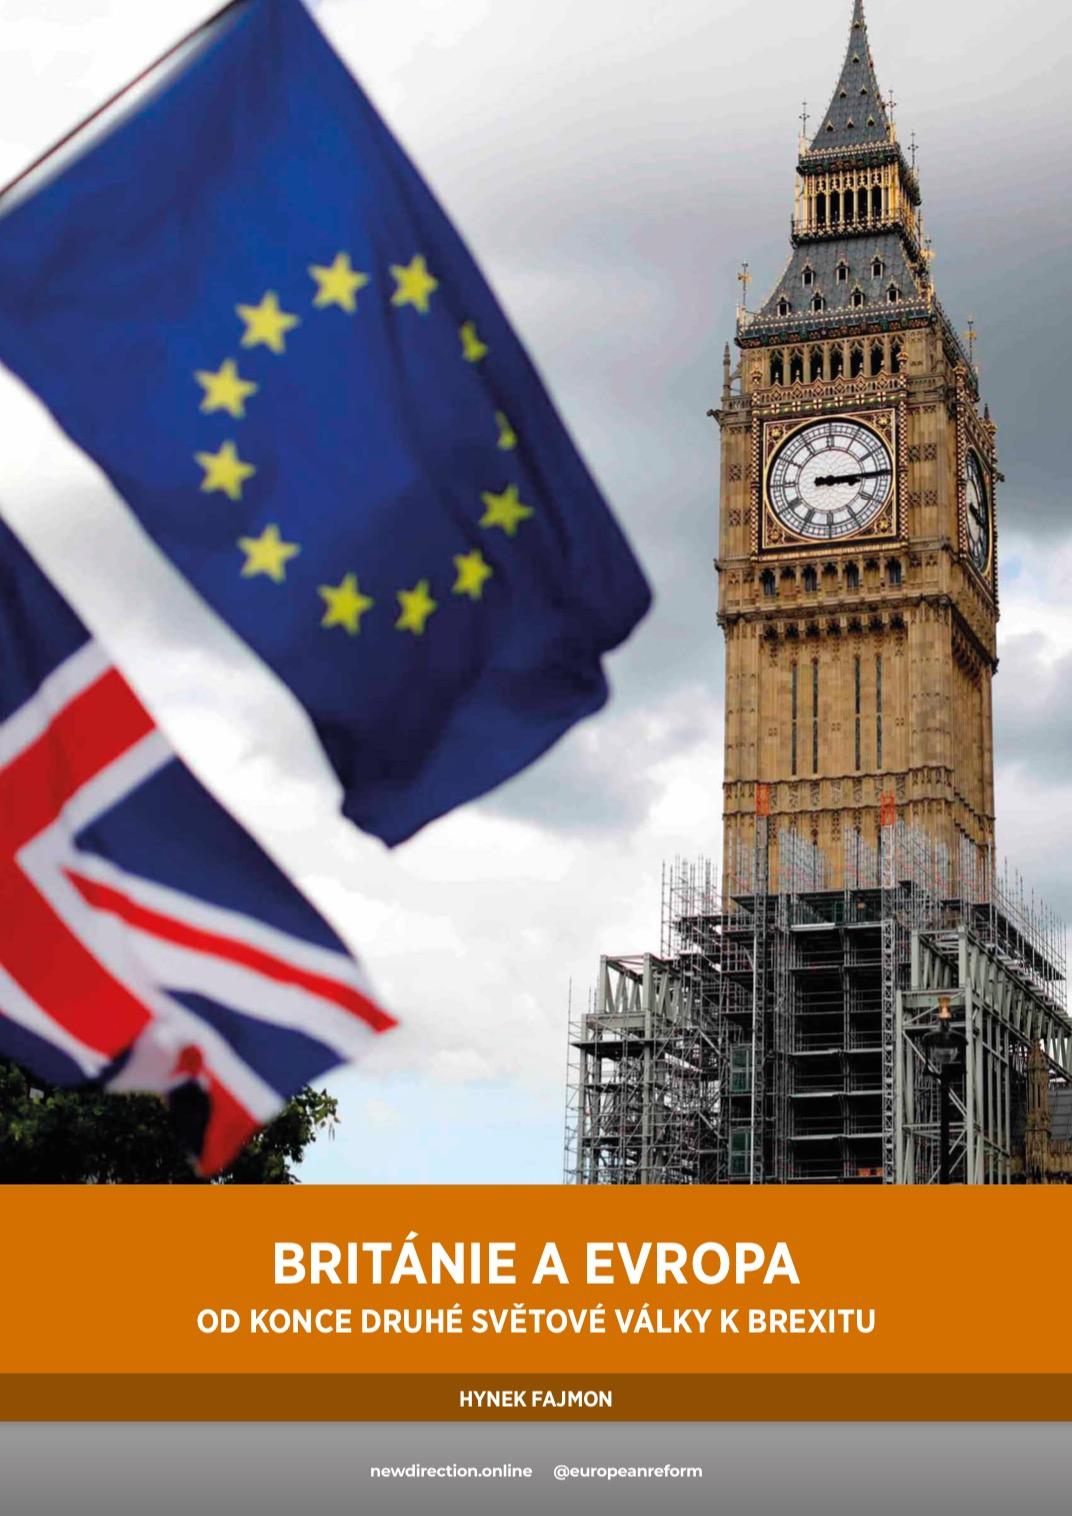 BRITÁNIE A EVROPA - OD KONCE DRUHÉ SVĚTOVÉ VÁLKY K BREXITU